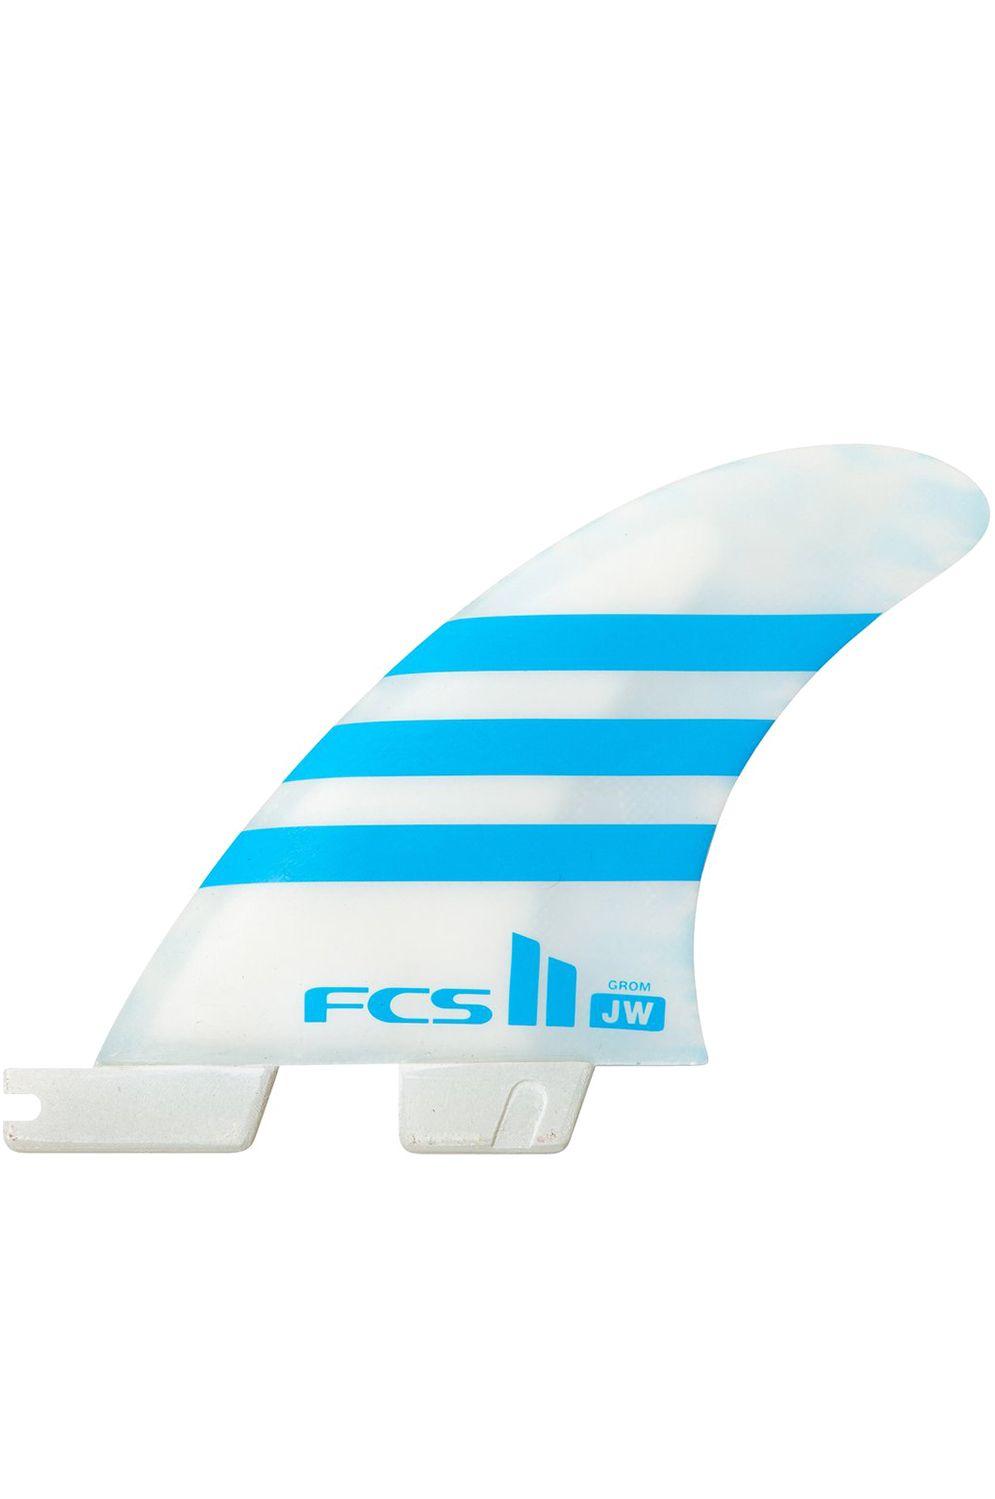 Quilha Fcs FCS II JW PC GROM BLUE/WHITE TRI Tri